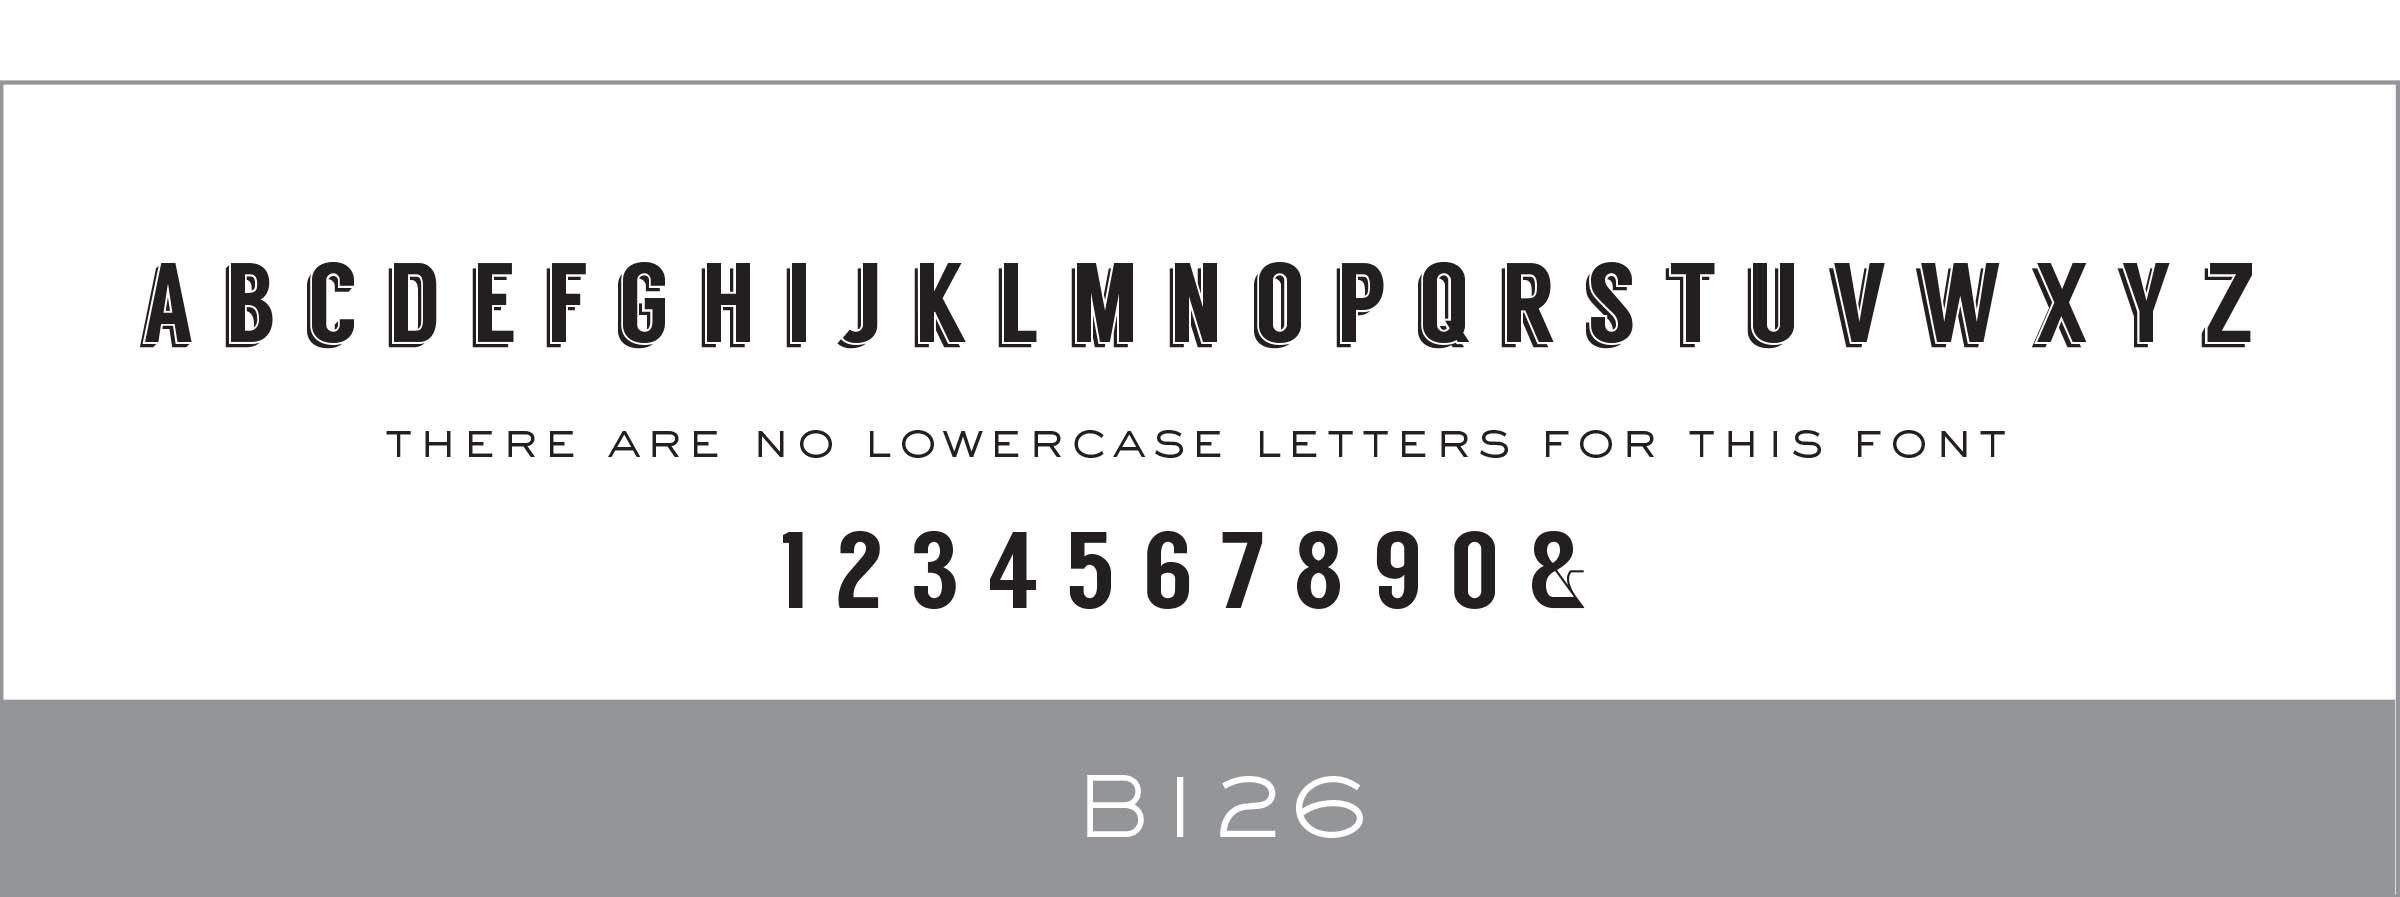 B126_Haute_Papier_Font.jpg